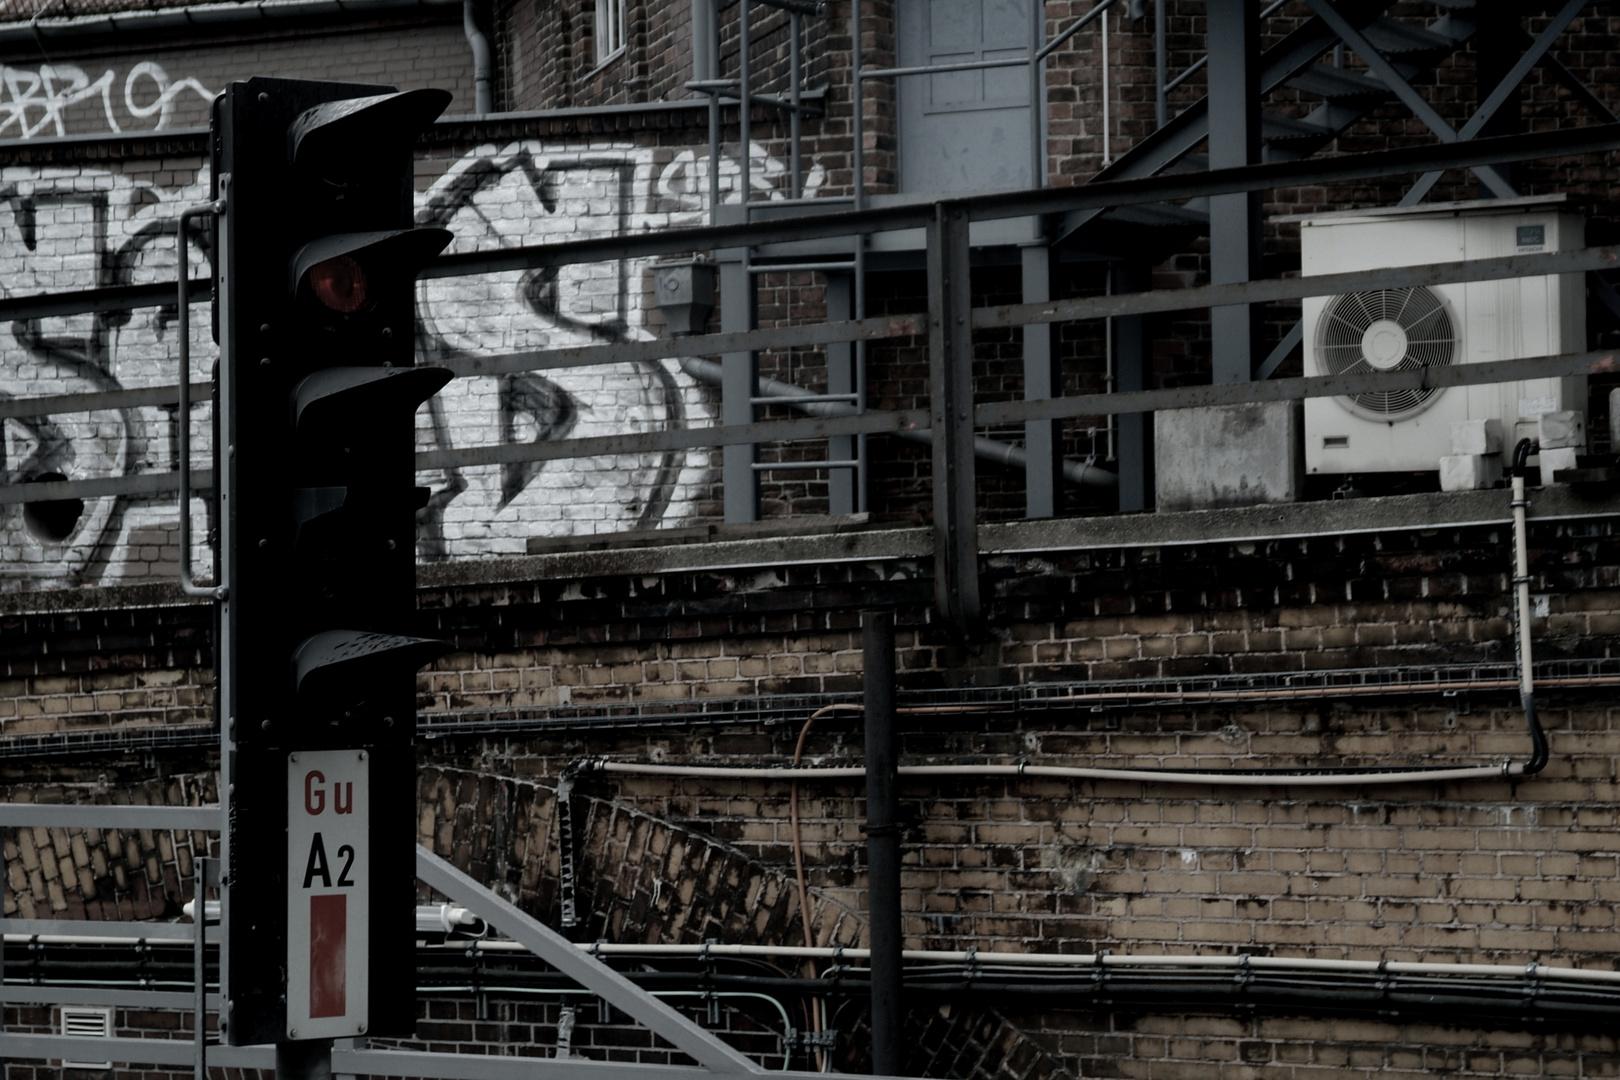 BERLIN | GLEISDREIECK | U-BAHN